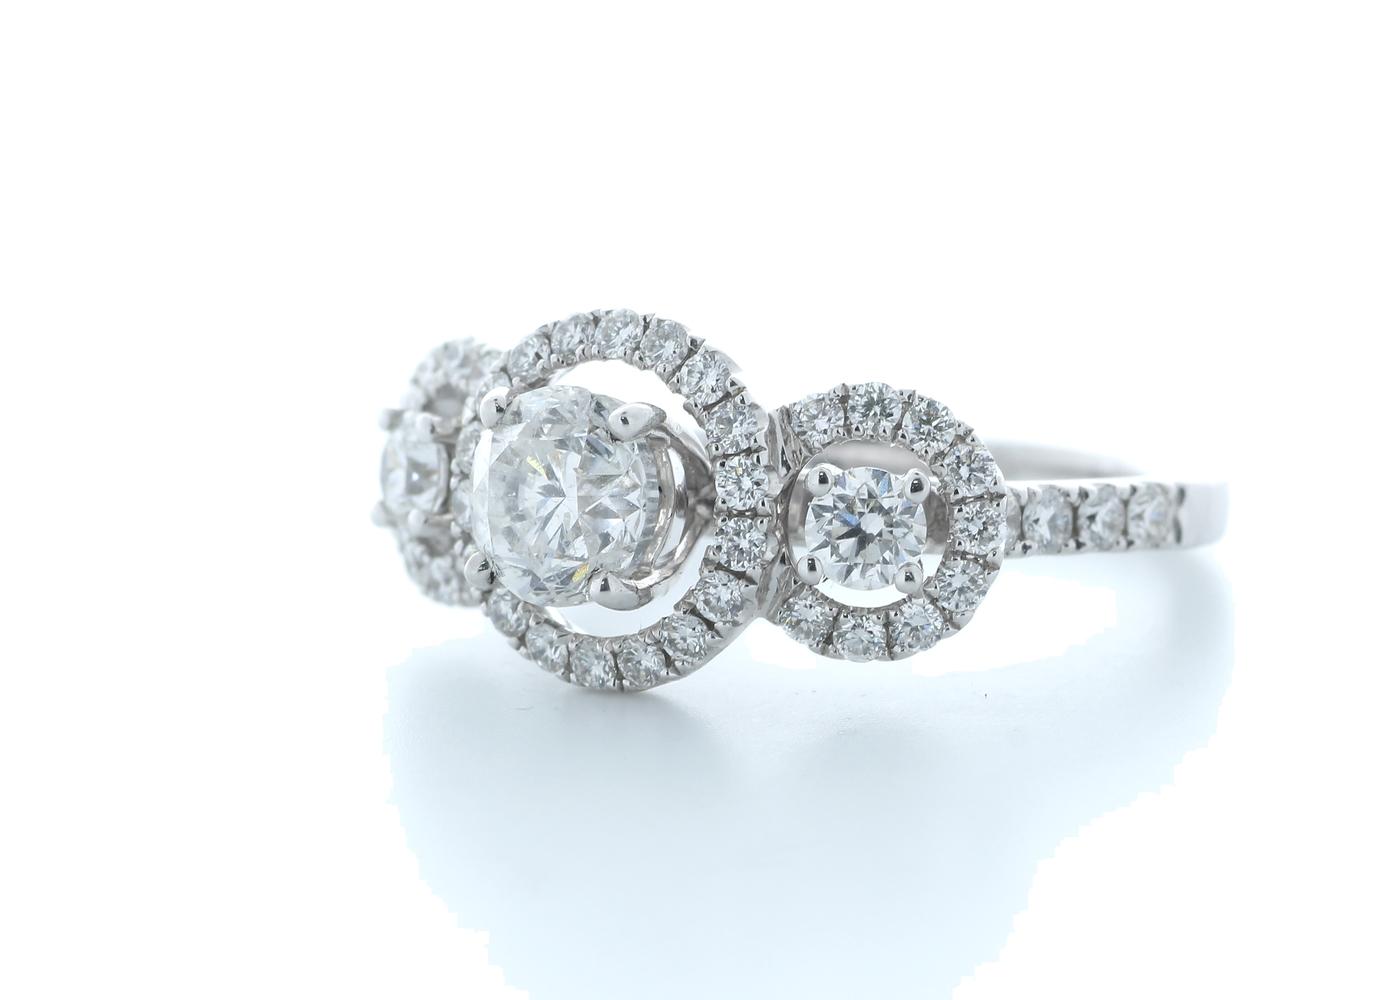 18ct White Gold Three Stone Halo Set Diamond Ring 1.91 Carats - Image 2 of 5